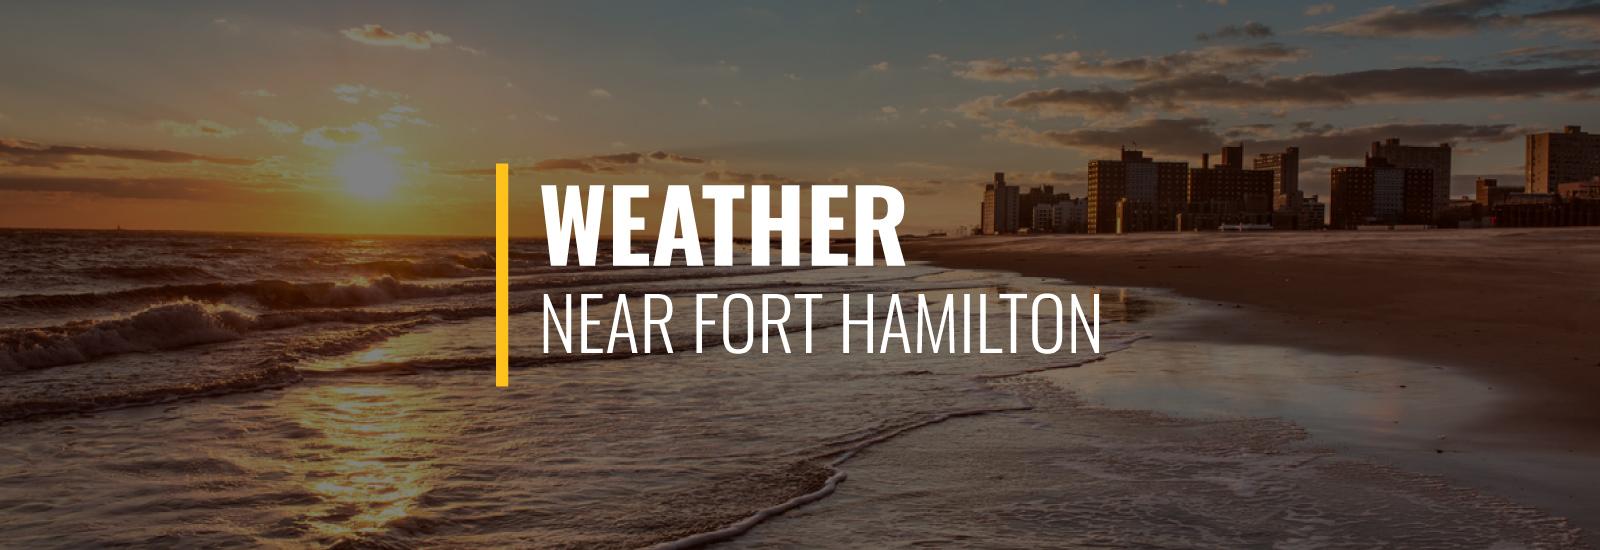 Fort Hamilton Weather